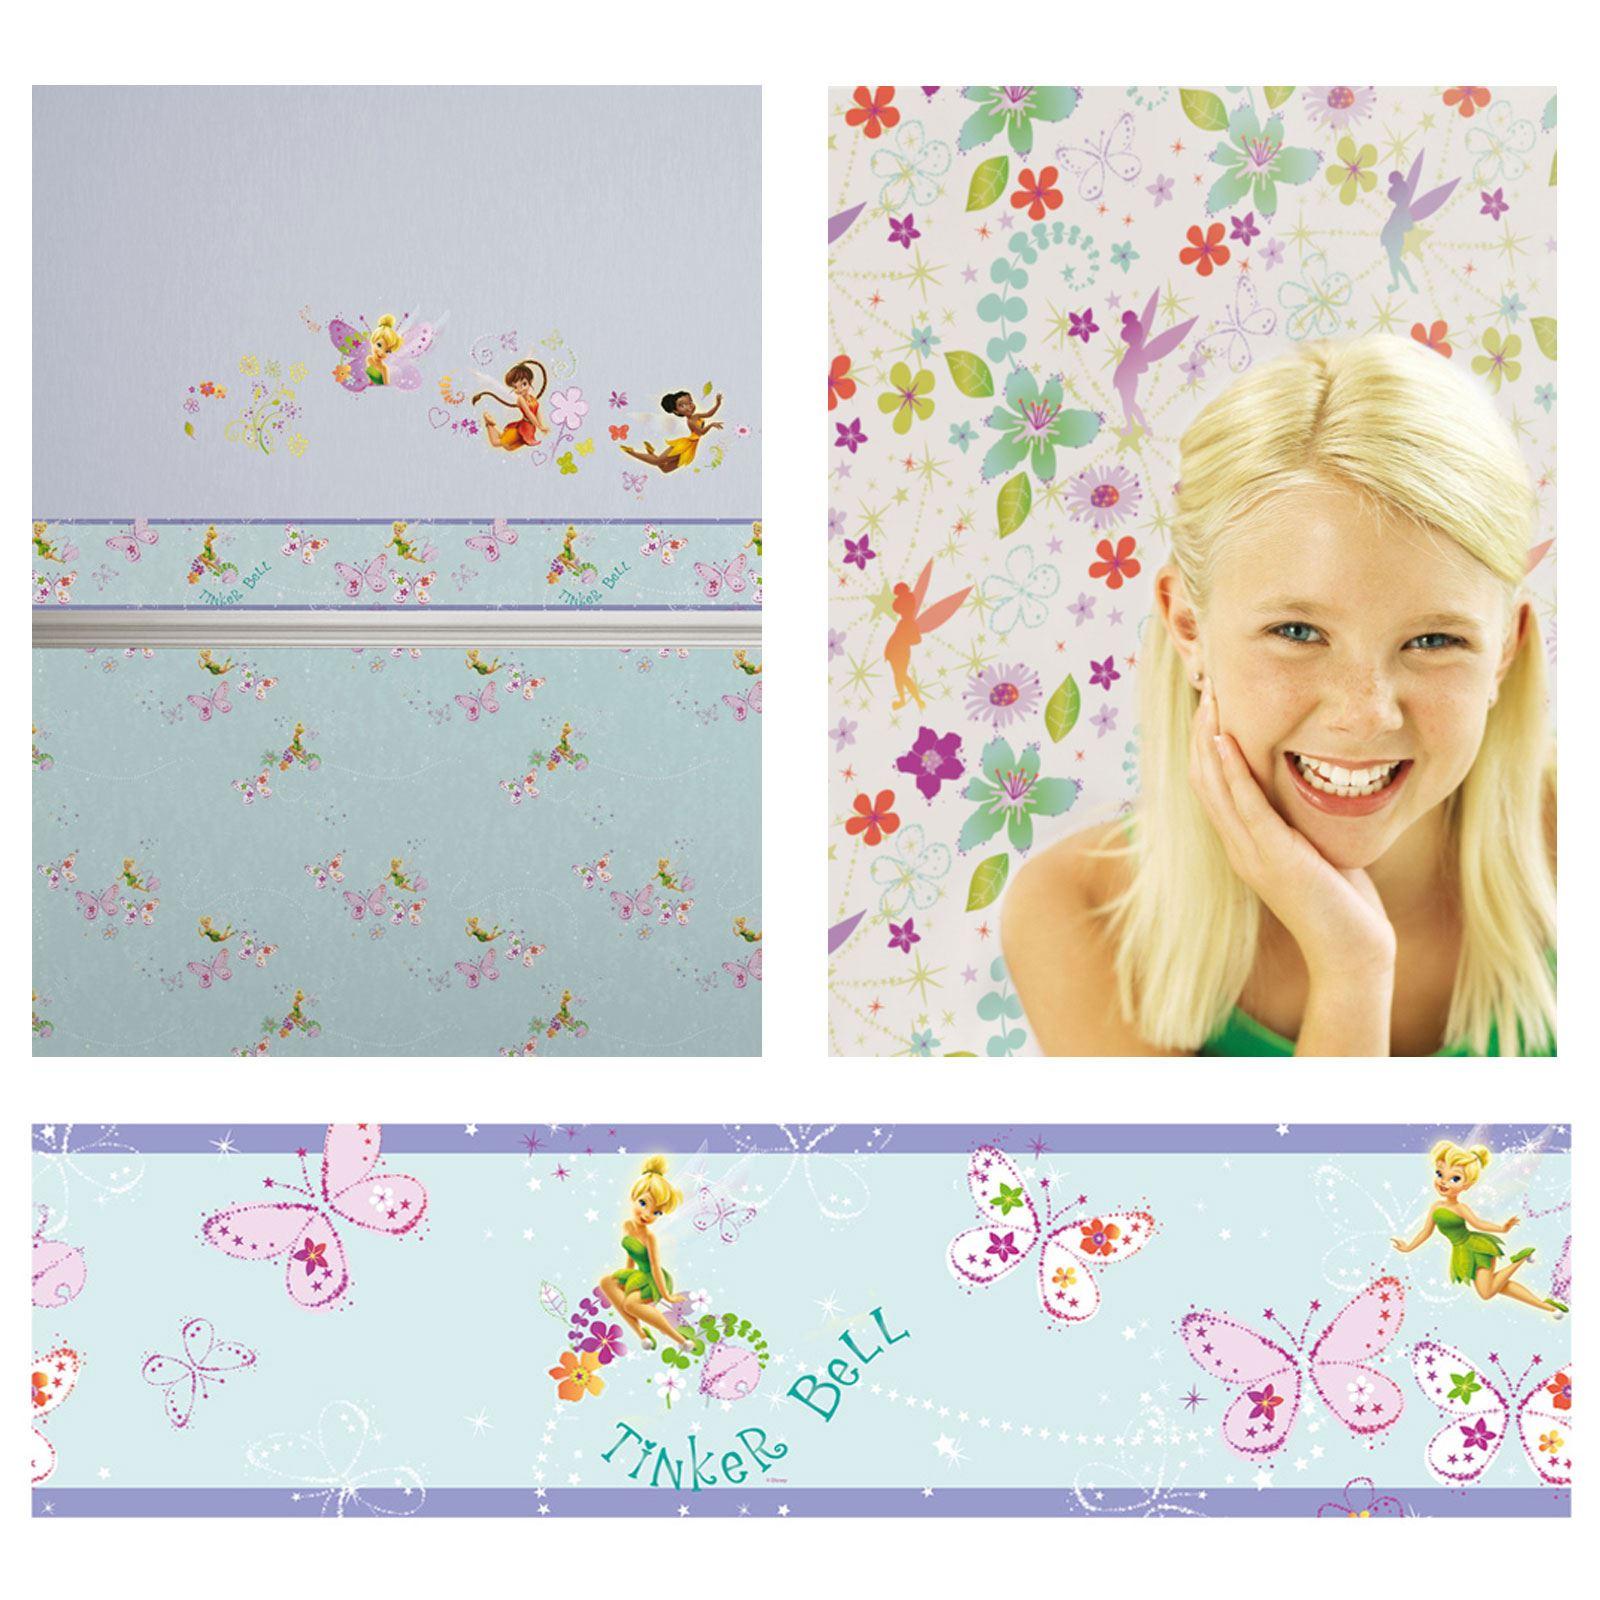 disney fairies tink wallpaper and borders bedroom decor ebay